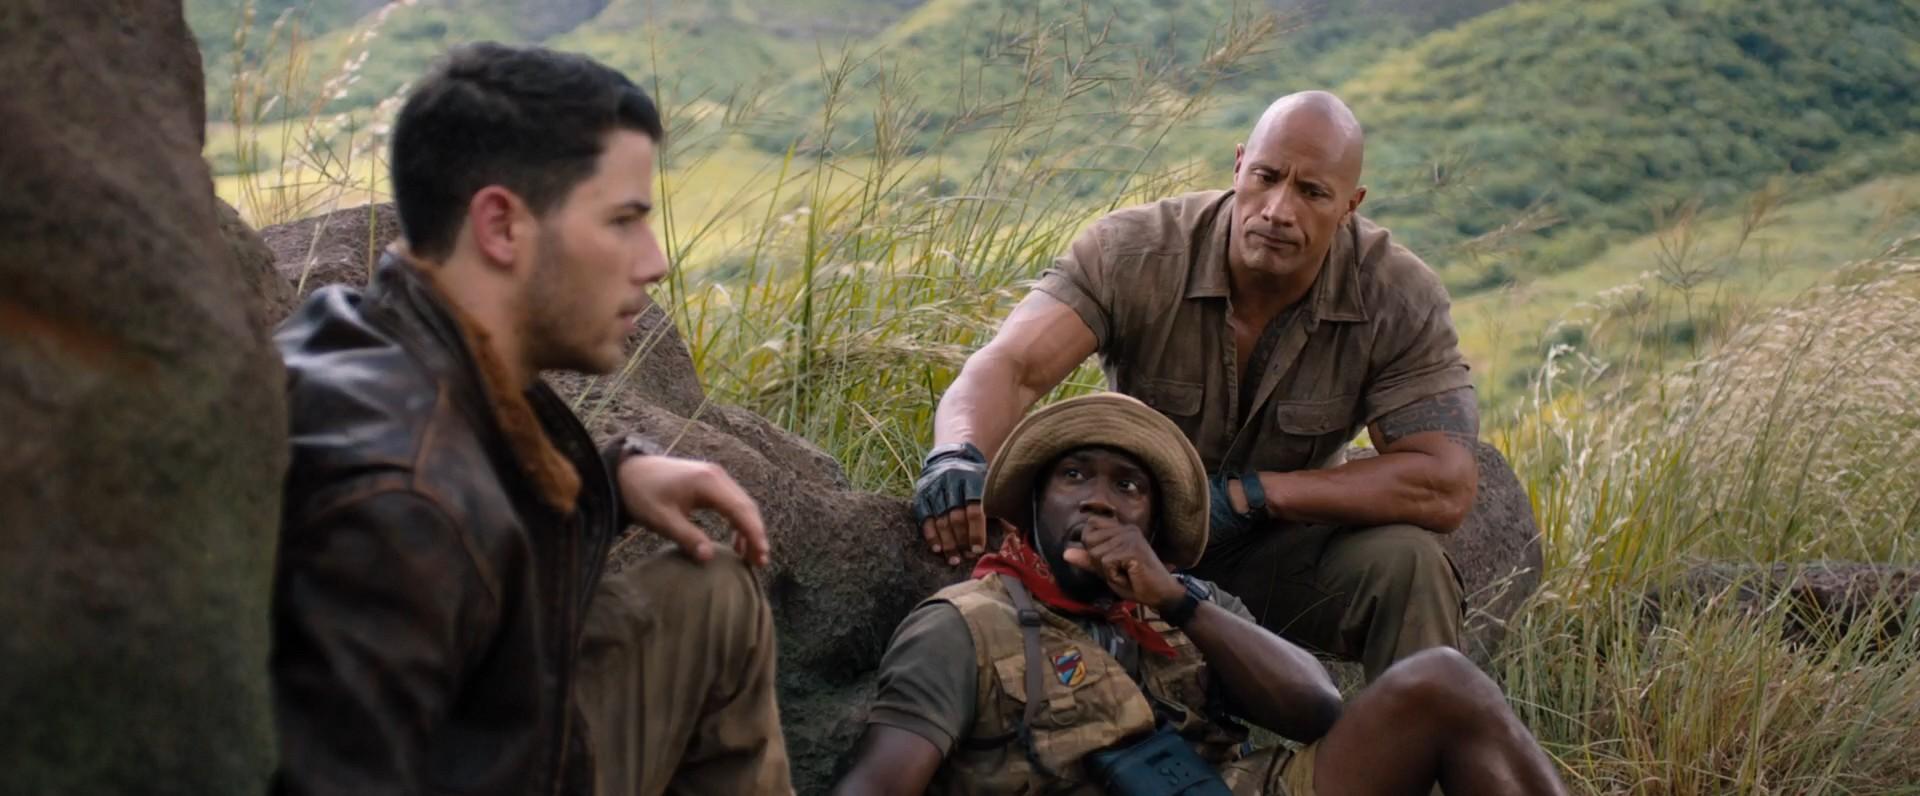 Джуманджи: Зов джунглей / Jumanji: Welcome to the Jungle (2017) WEB-DL 1080p